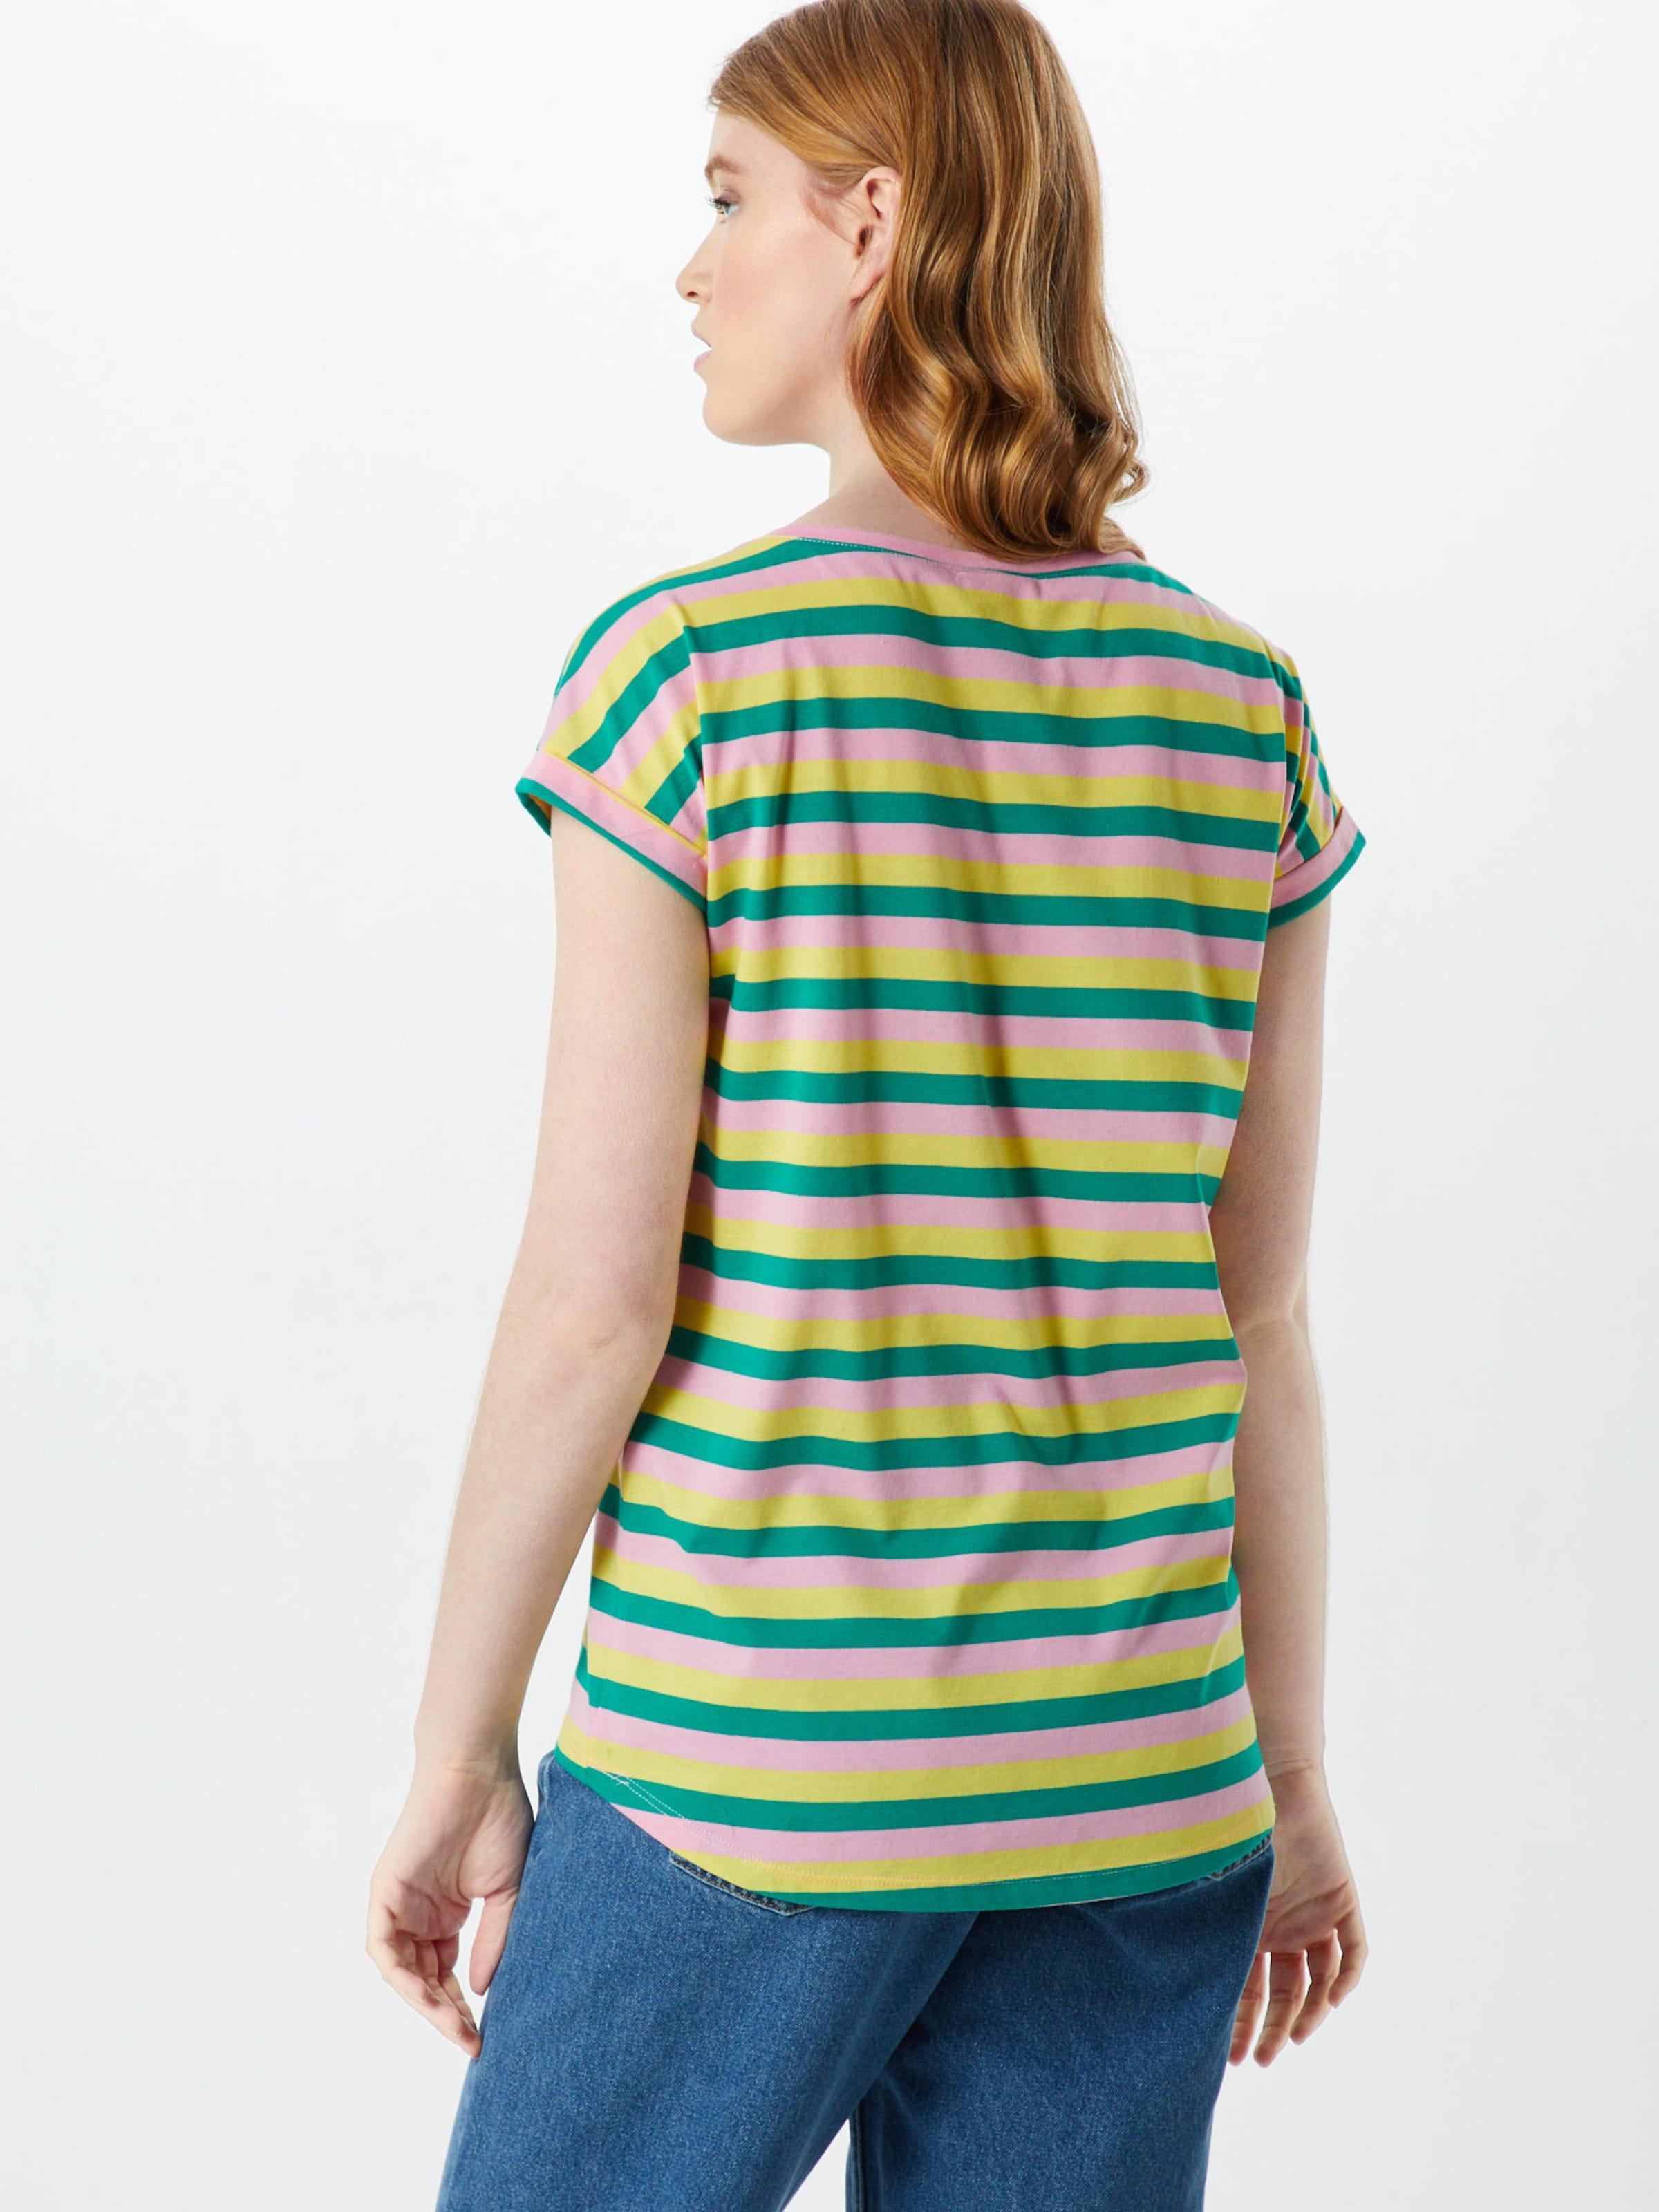 shirt 'dreamers' En Vila T RoseBlanc Ybf6yI7gvm